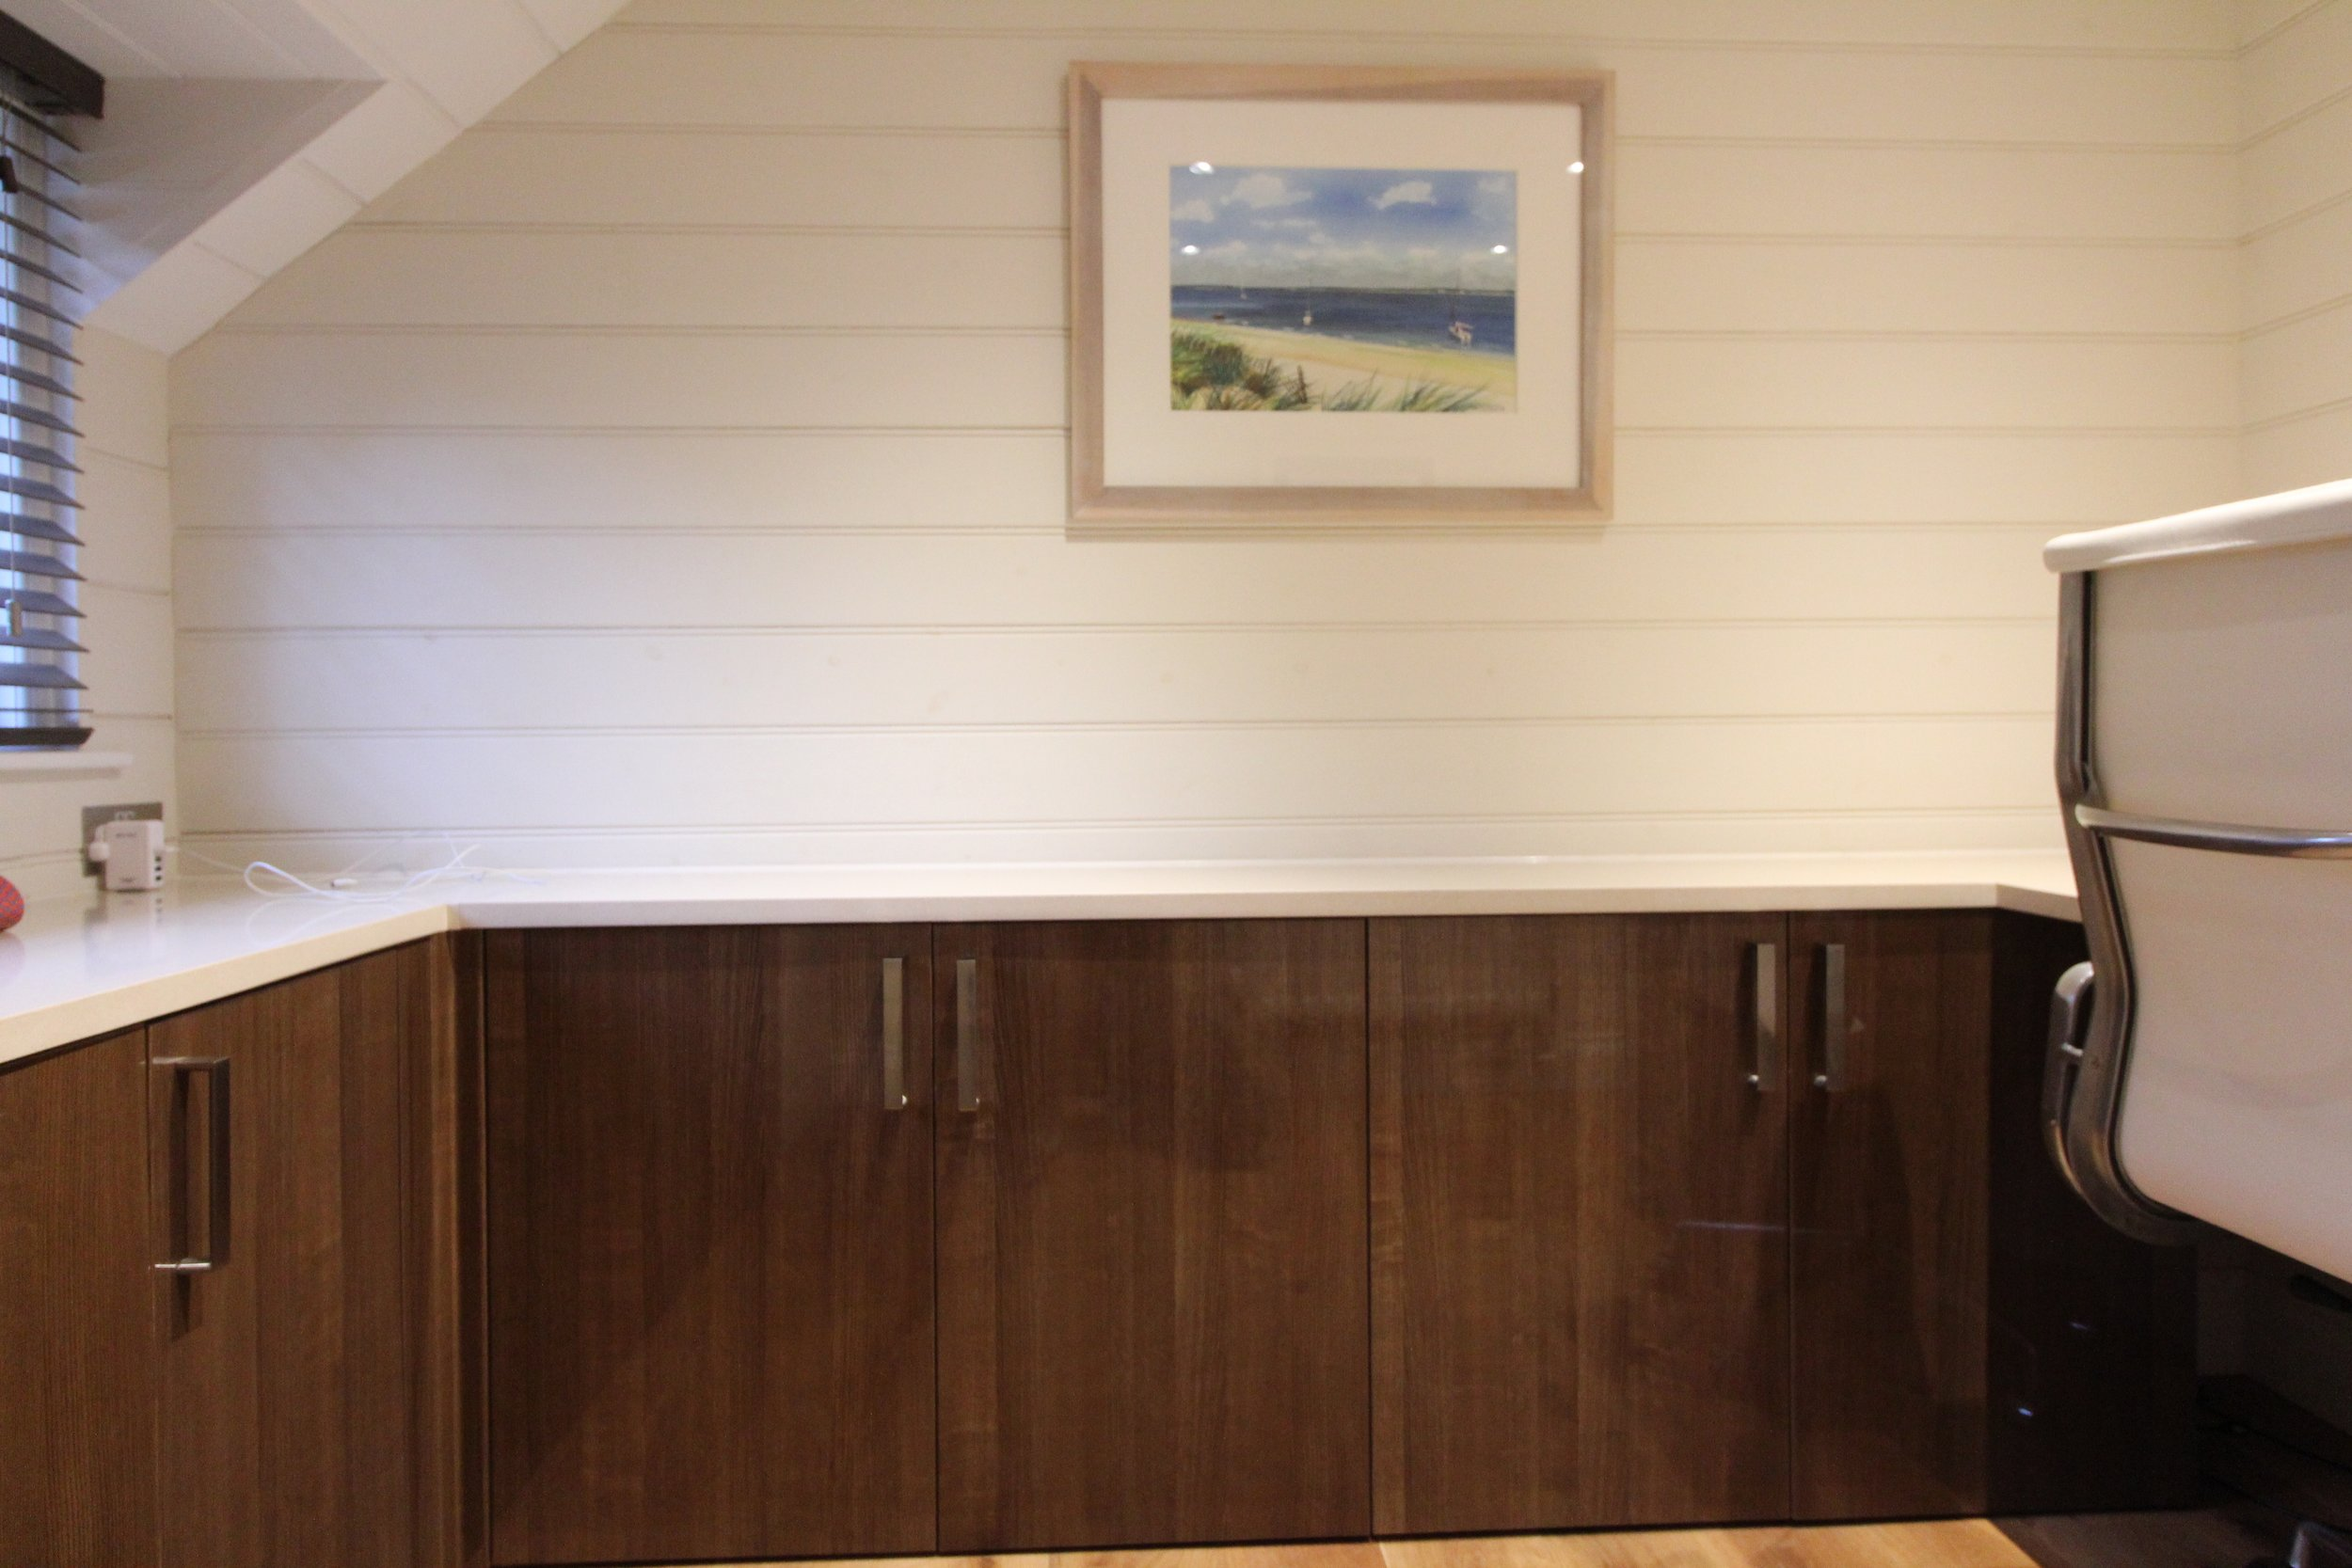 Silestone worktops create a clean workspace over storage cabinets.